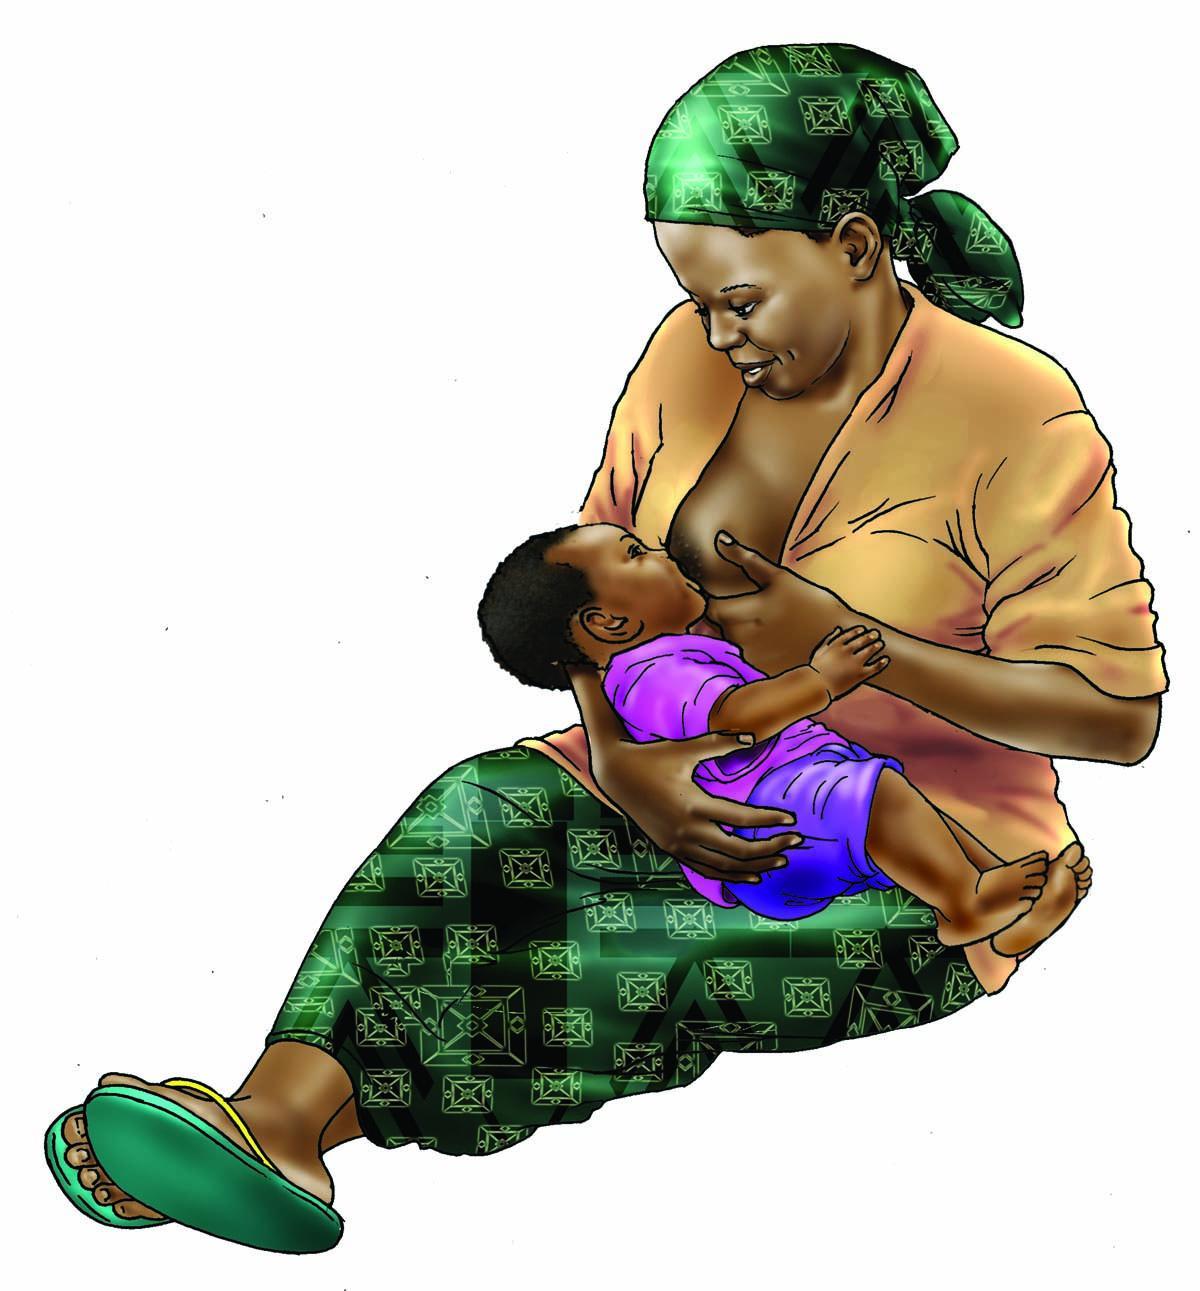 Breastfeeding - Breastfeeding 7-9pm 6-9 mo - 03A - Non-country specific